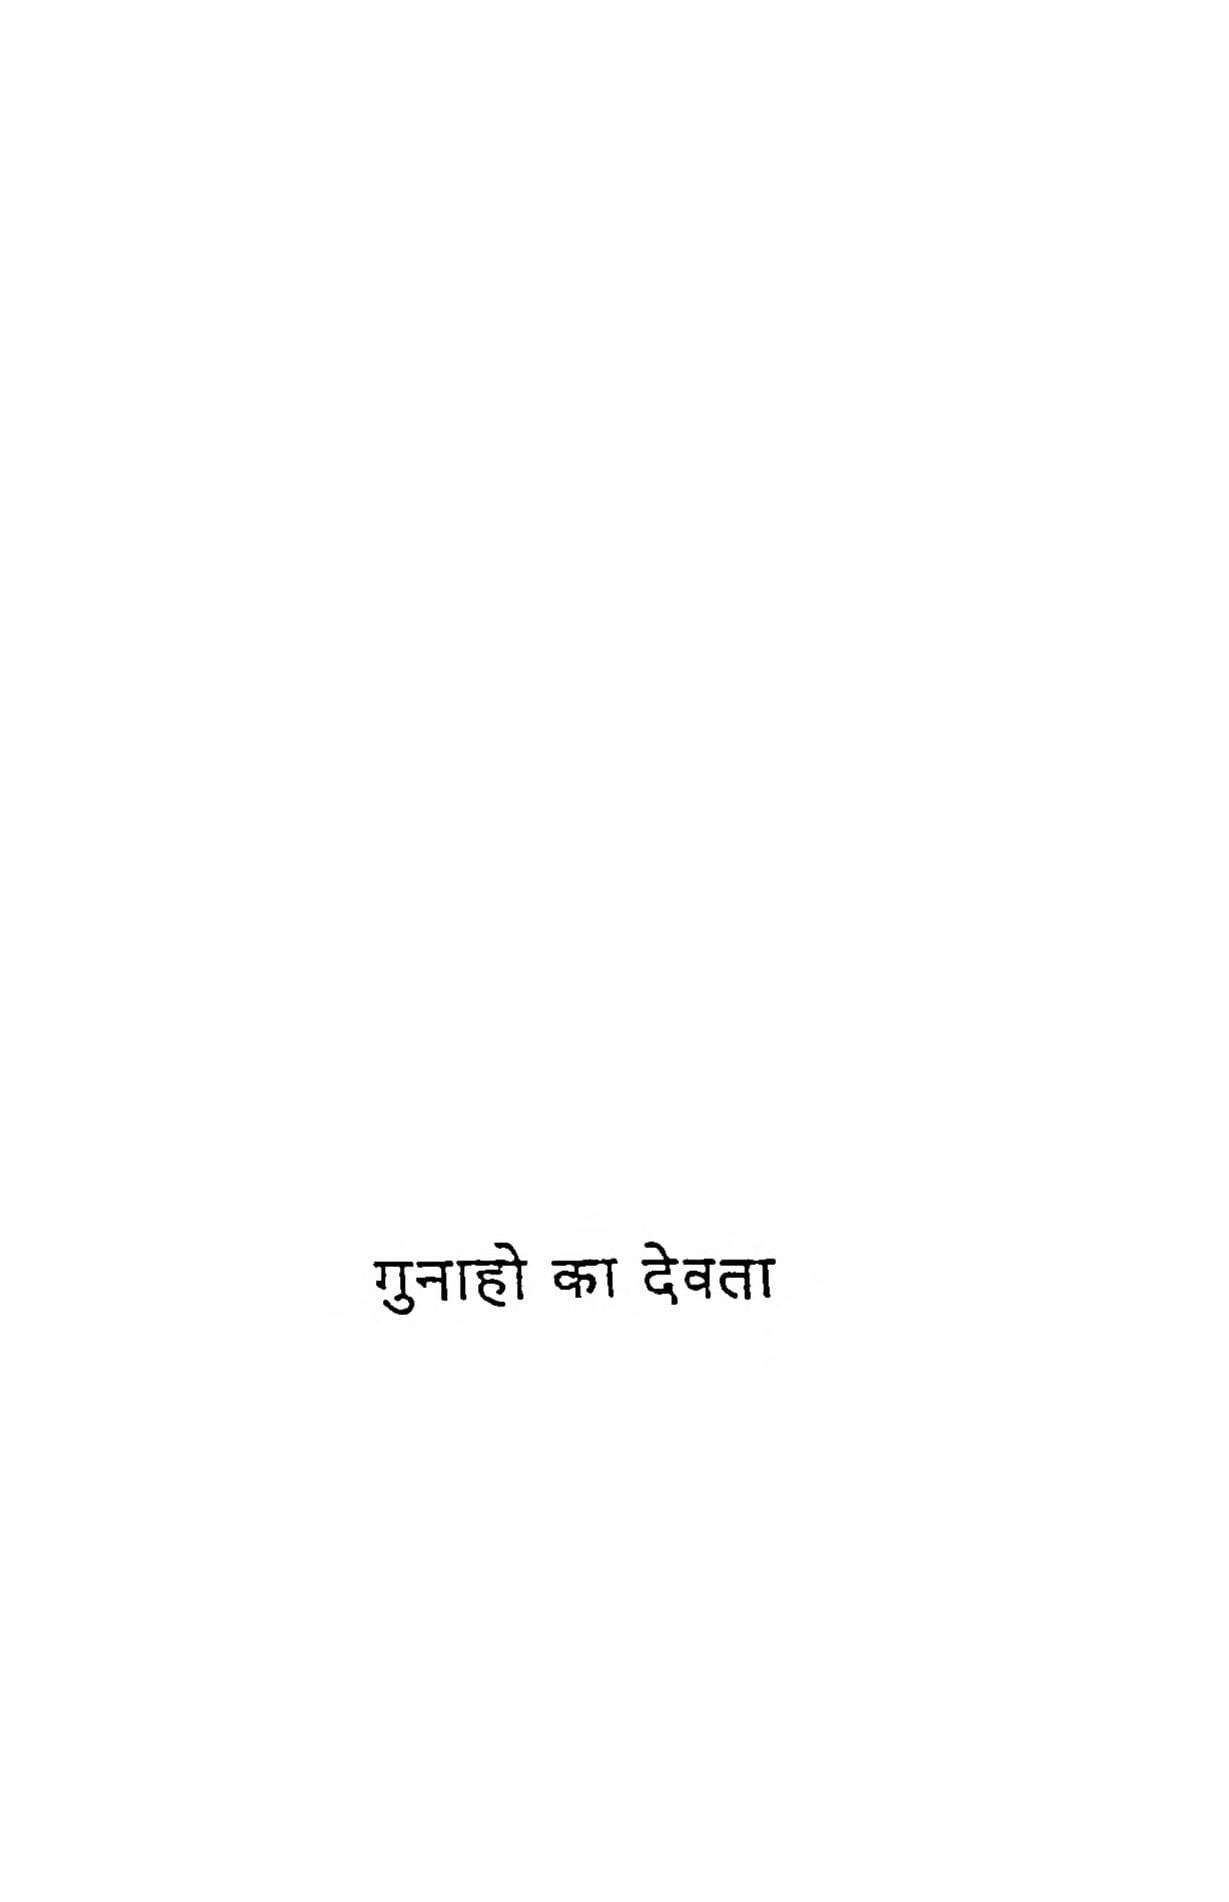 Gunahon Ka Devata by धर्मवीर भारती - Dharmvir Bharatiपंडित लक्ष्मी चंद्रजी जैन - Pt. Lakshmi Chandraji Jain